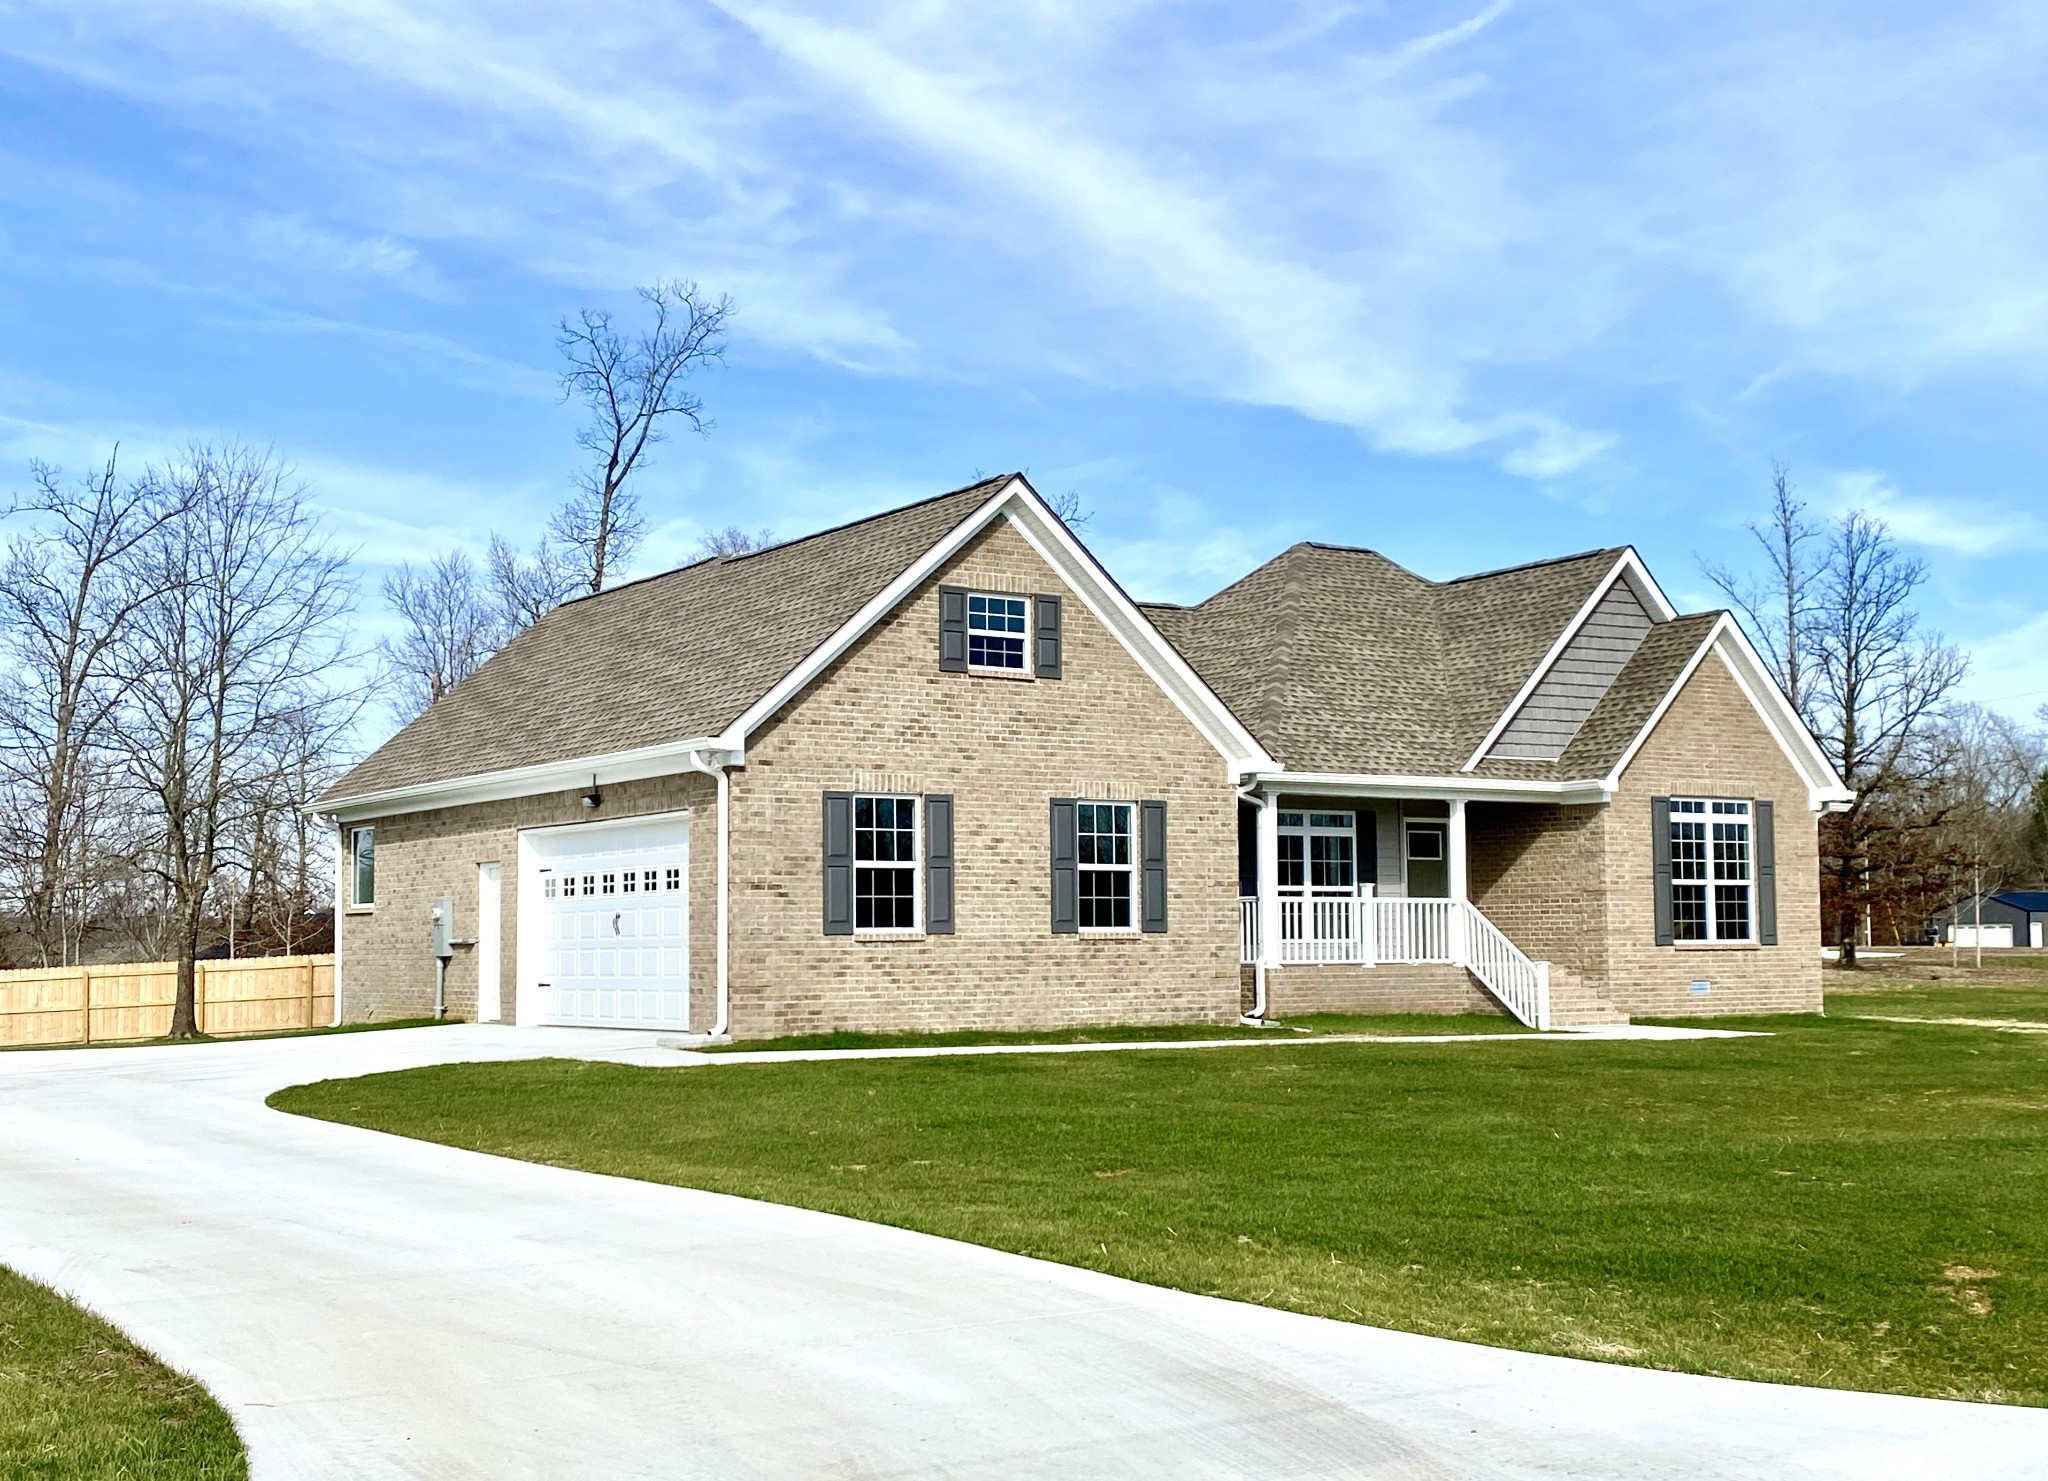 908 Presley Cir, Mount Pleasant, TN 38474 - Mount Pleasant, TN real estate listing